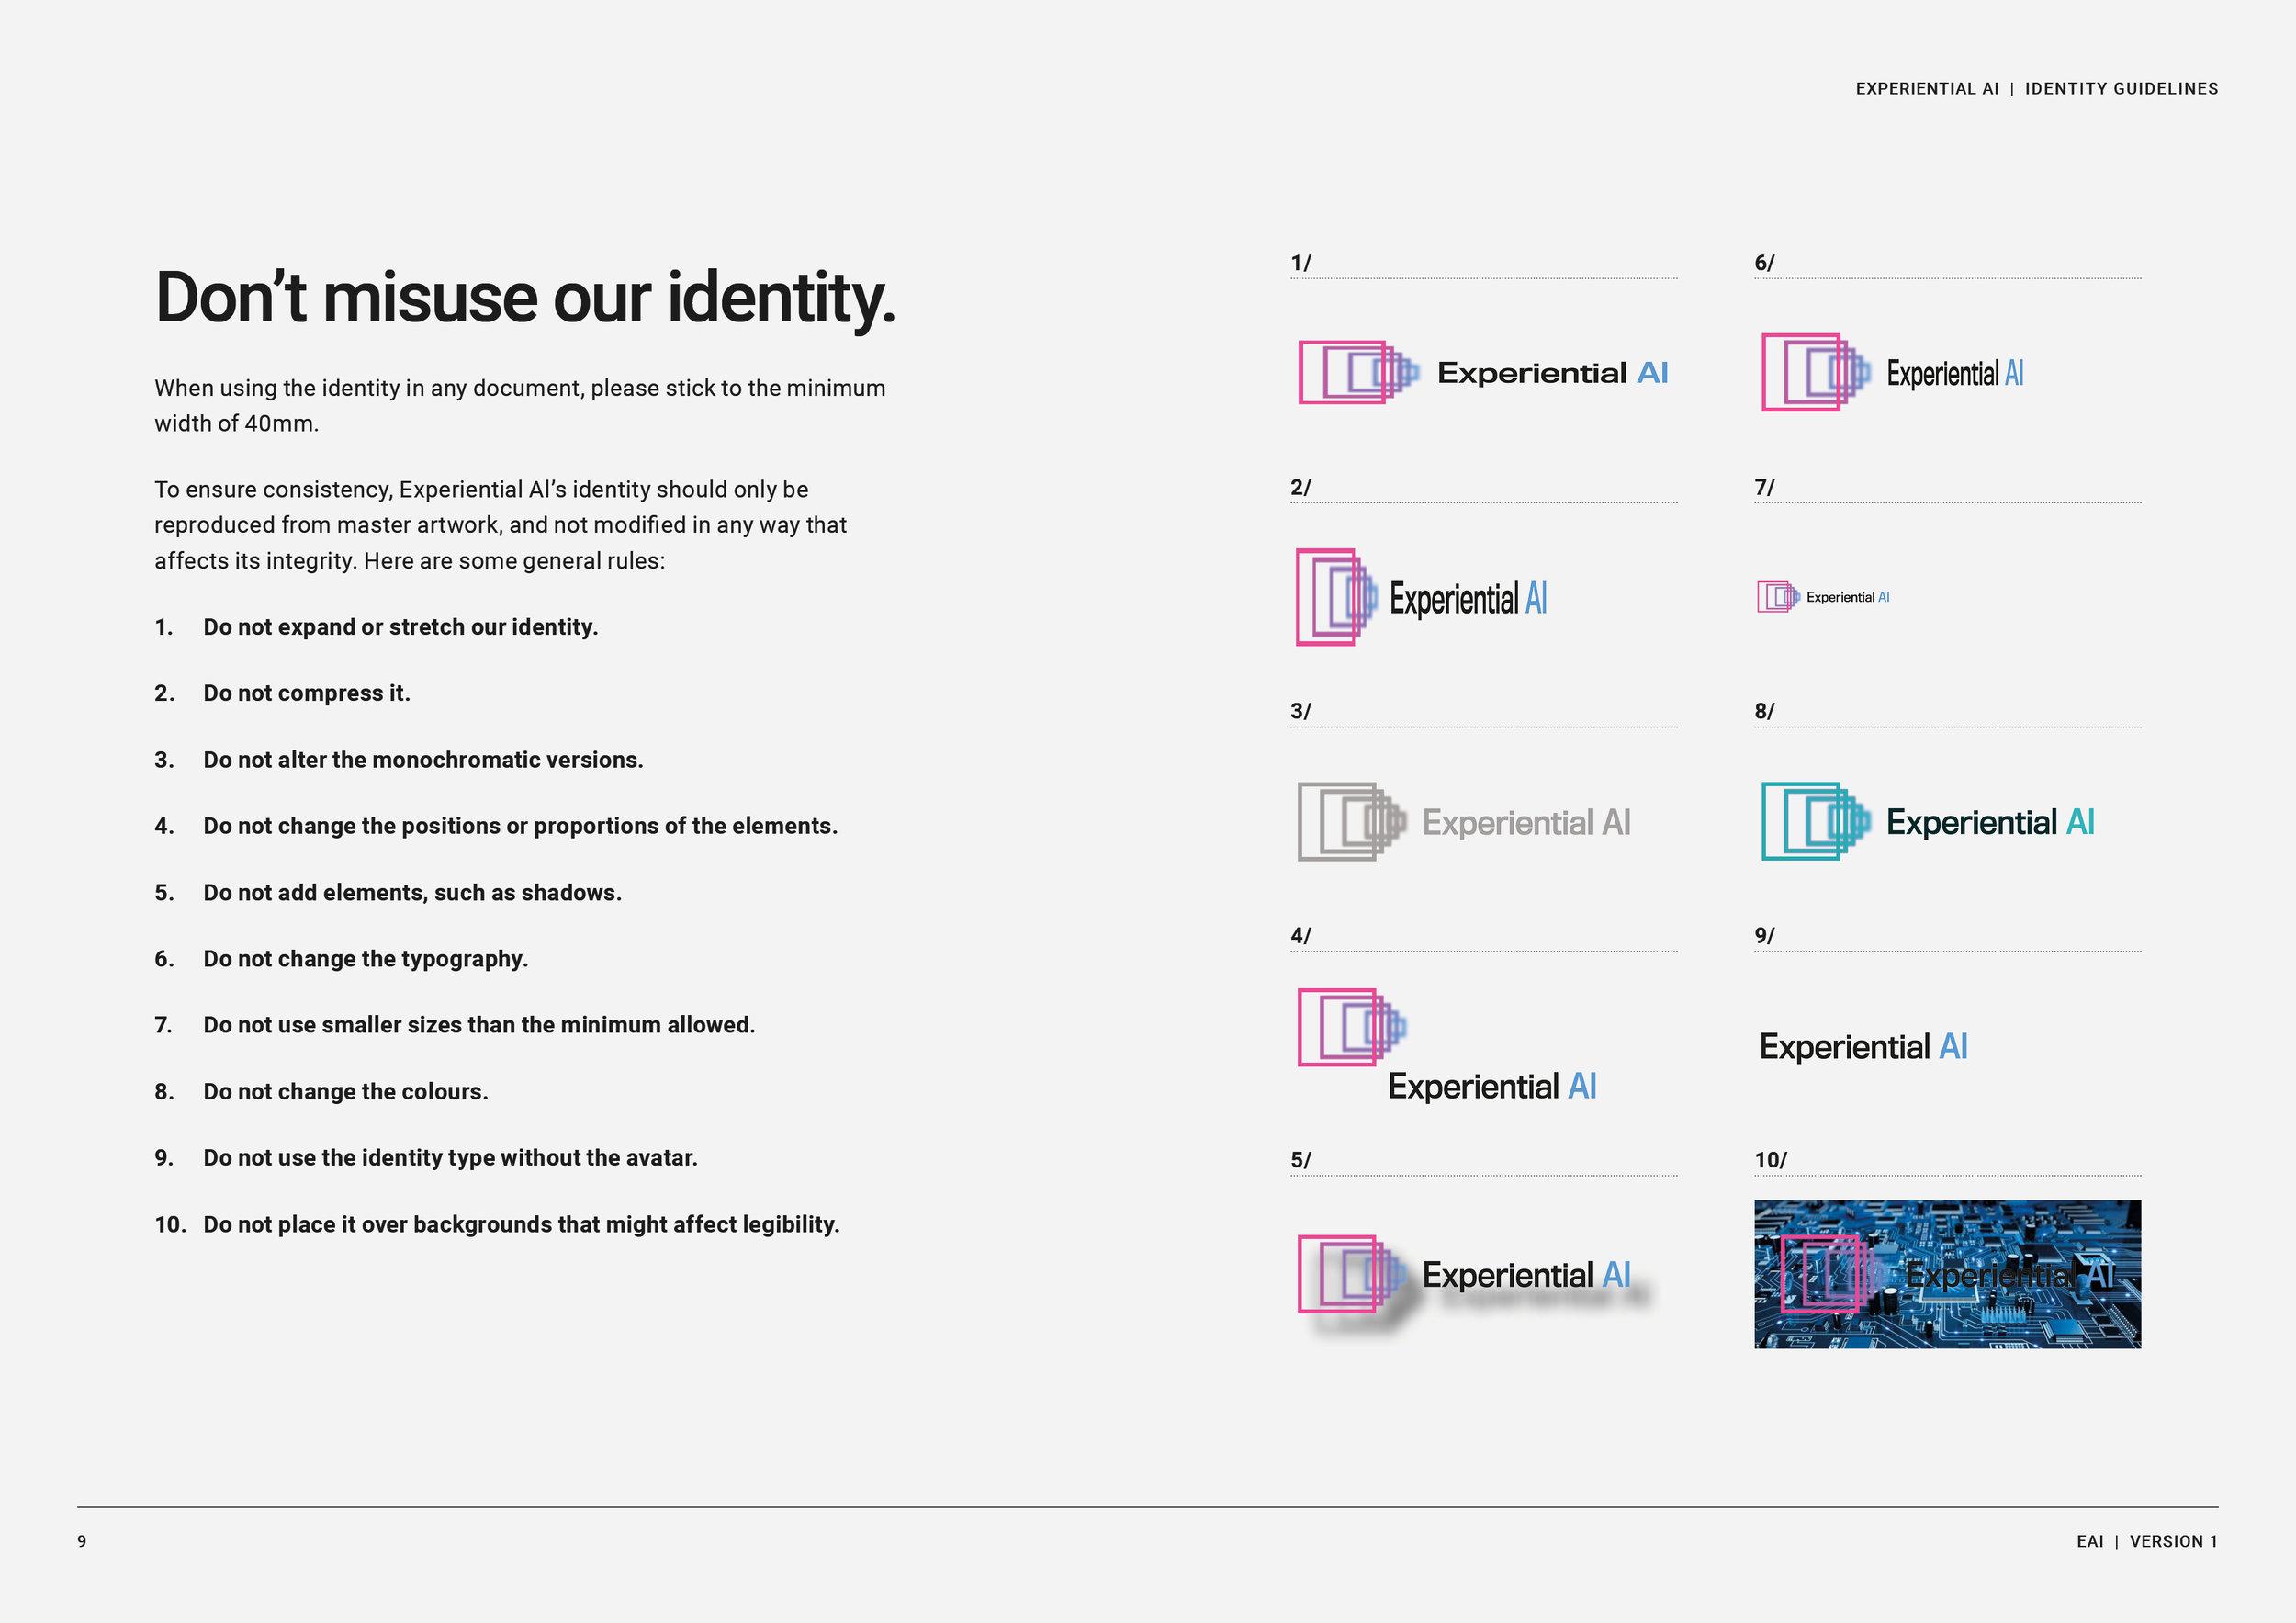 EAI_Identity_Guidelines9.jpg